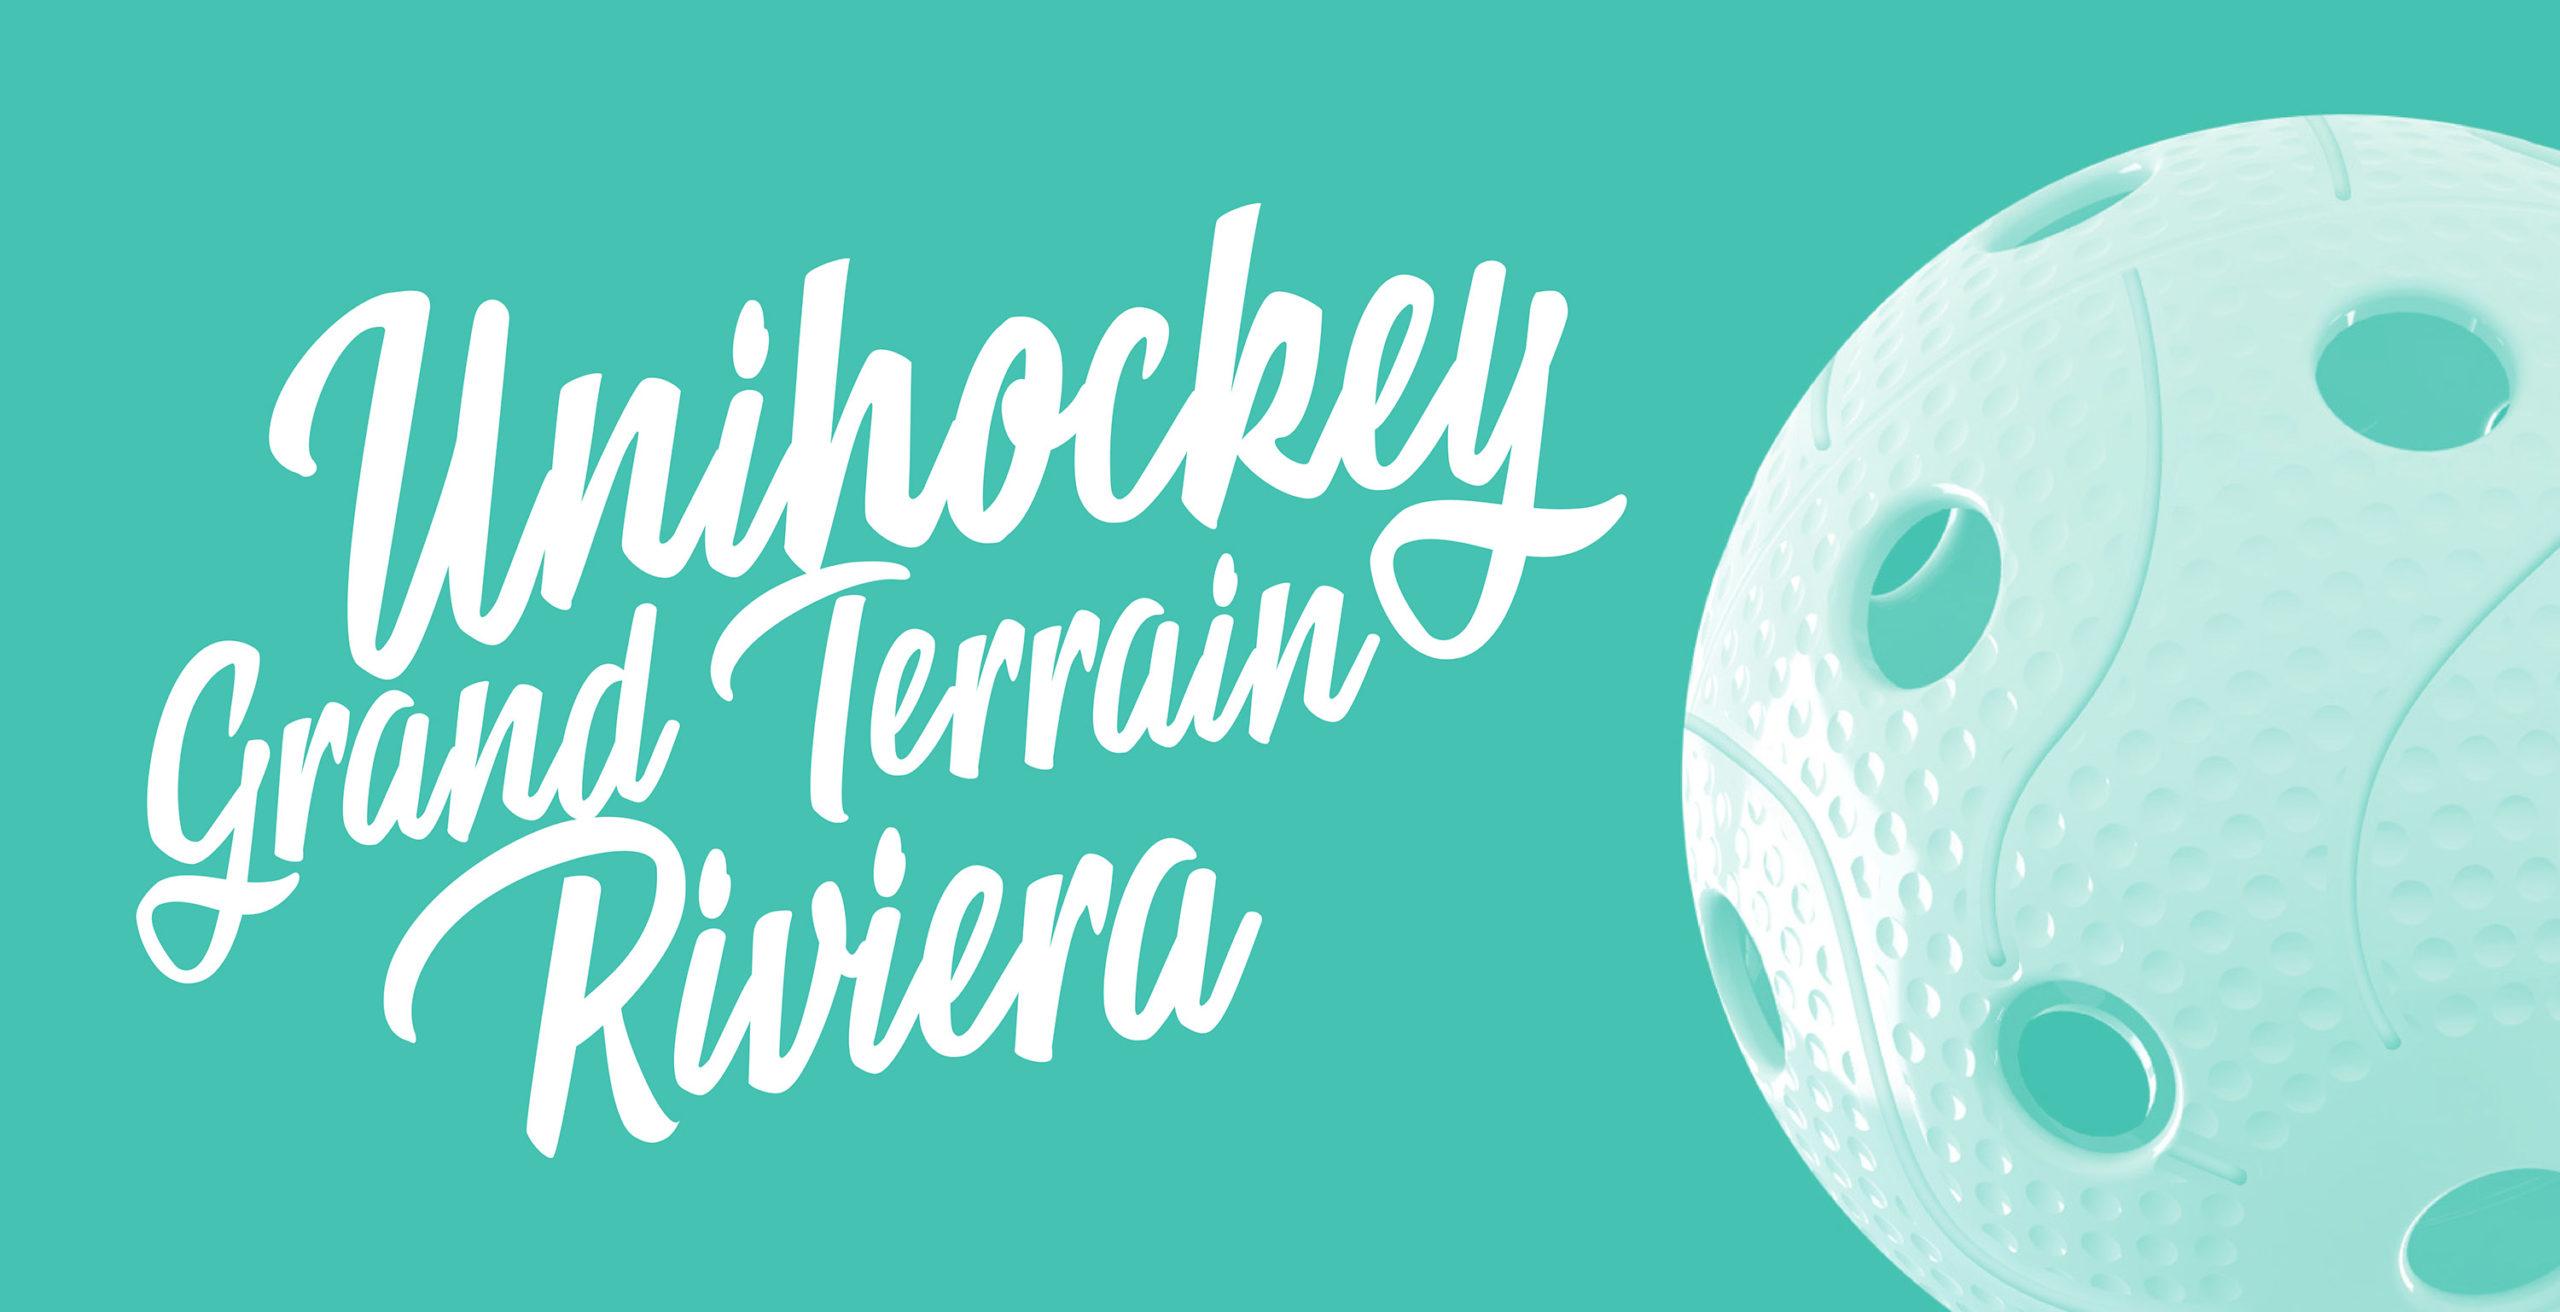 Soutenez le projet Unihockey Grand Terrain Riviera